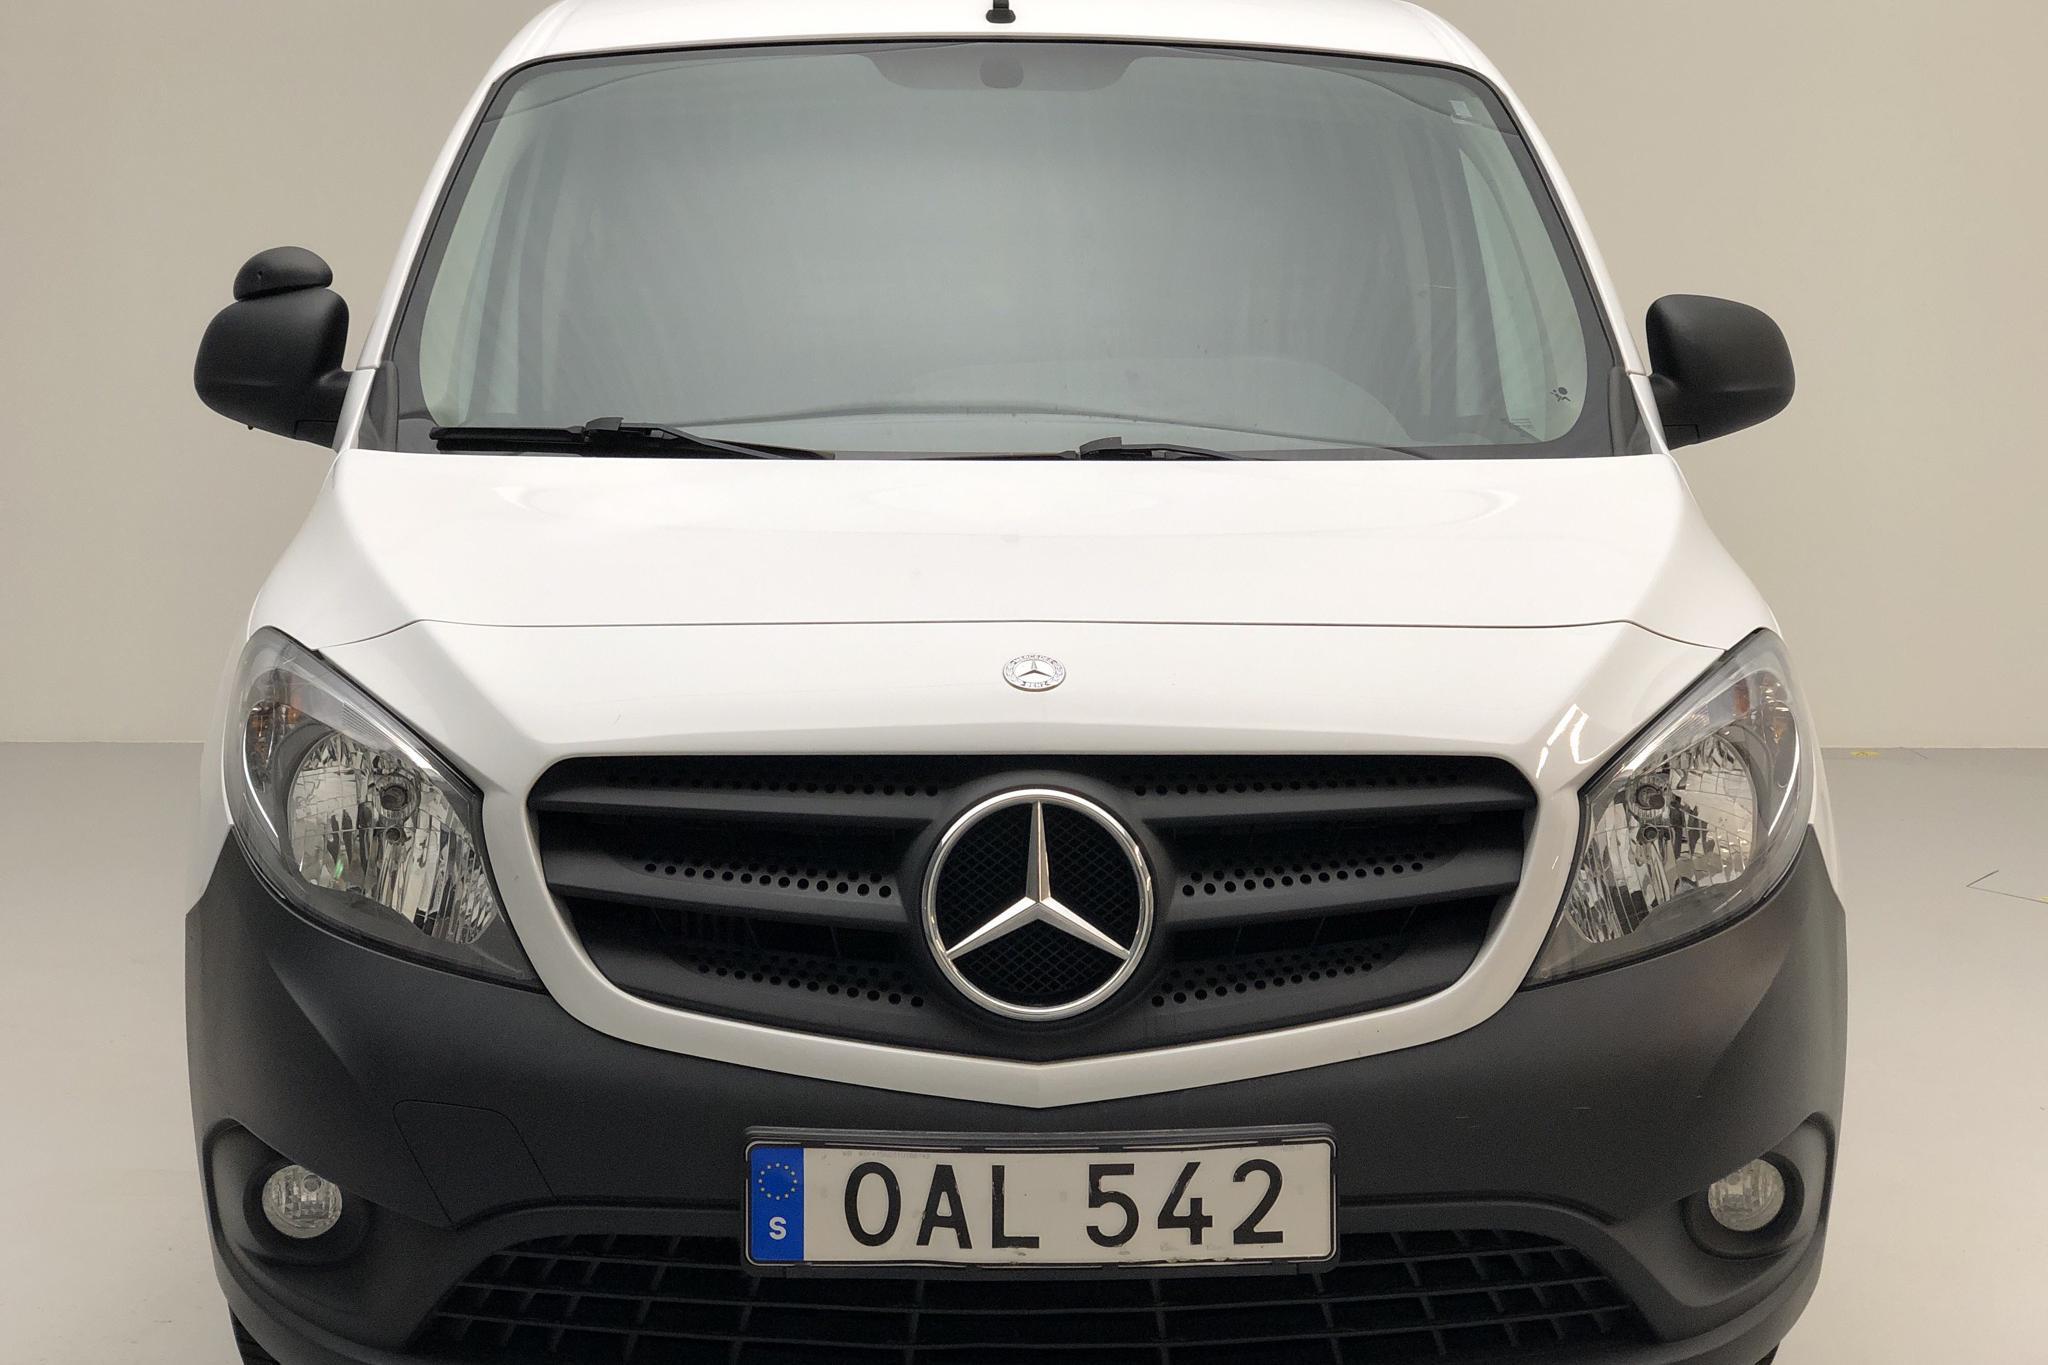 Mercedes Citan 109 1.5 CDI (90hk) - 5 190 mil - Manuell - vit - 2016